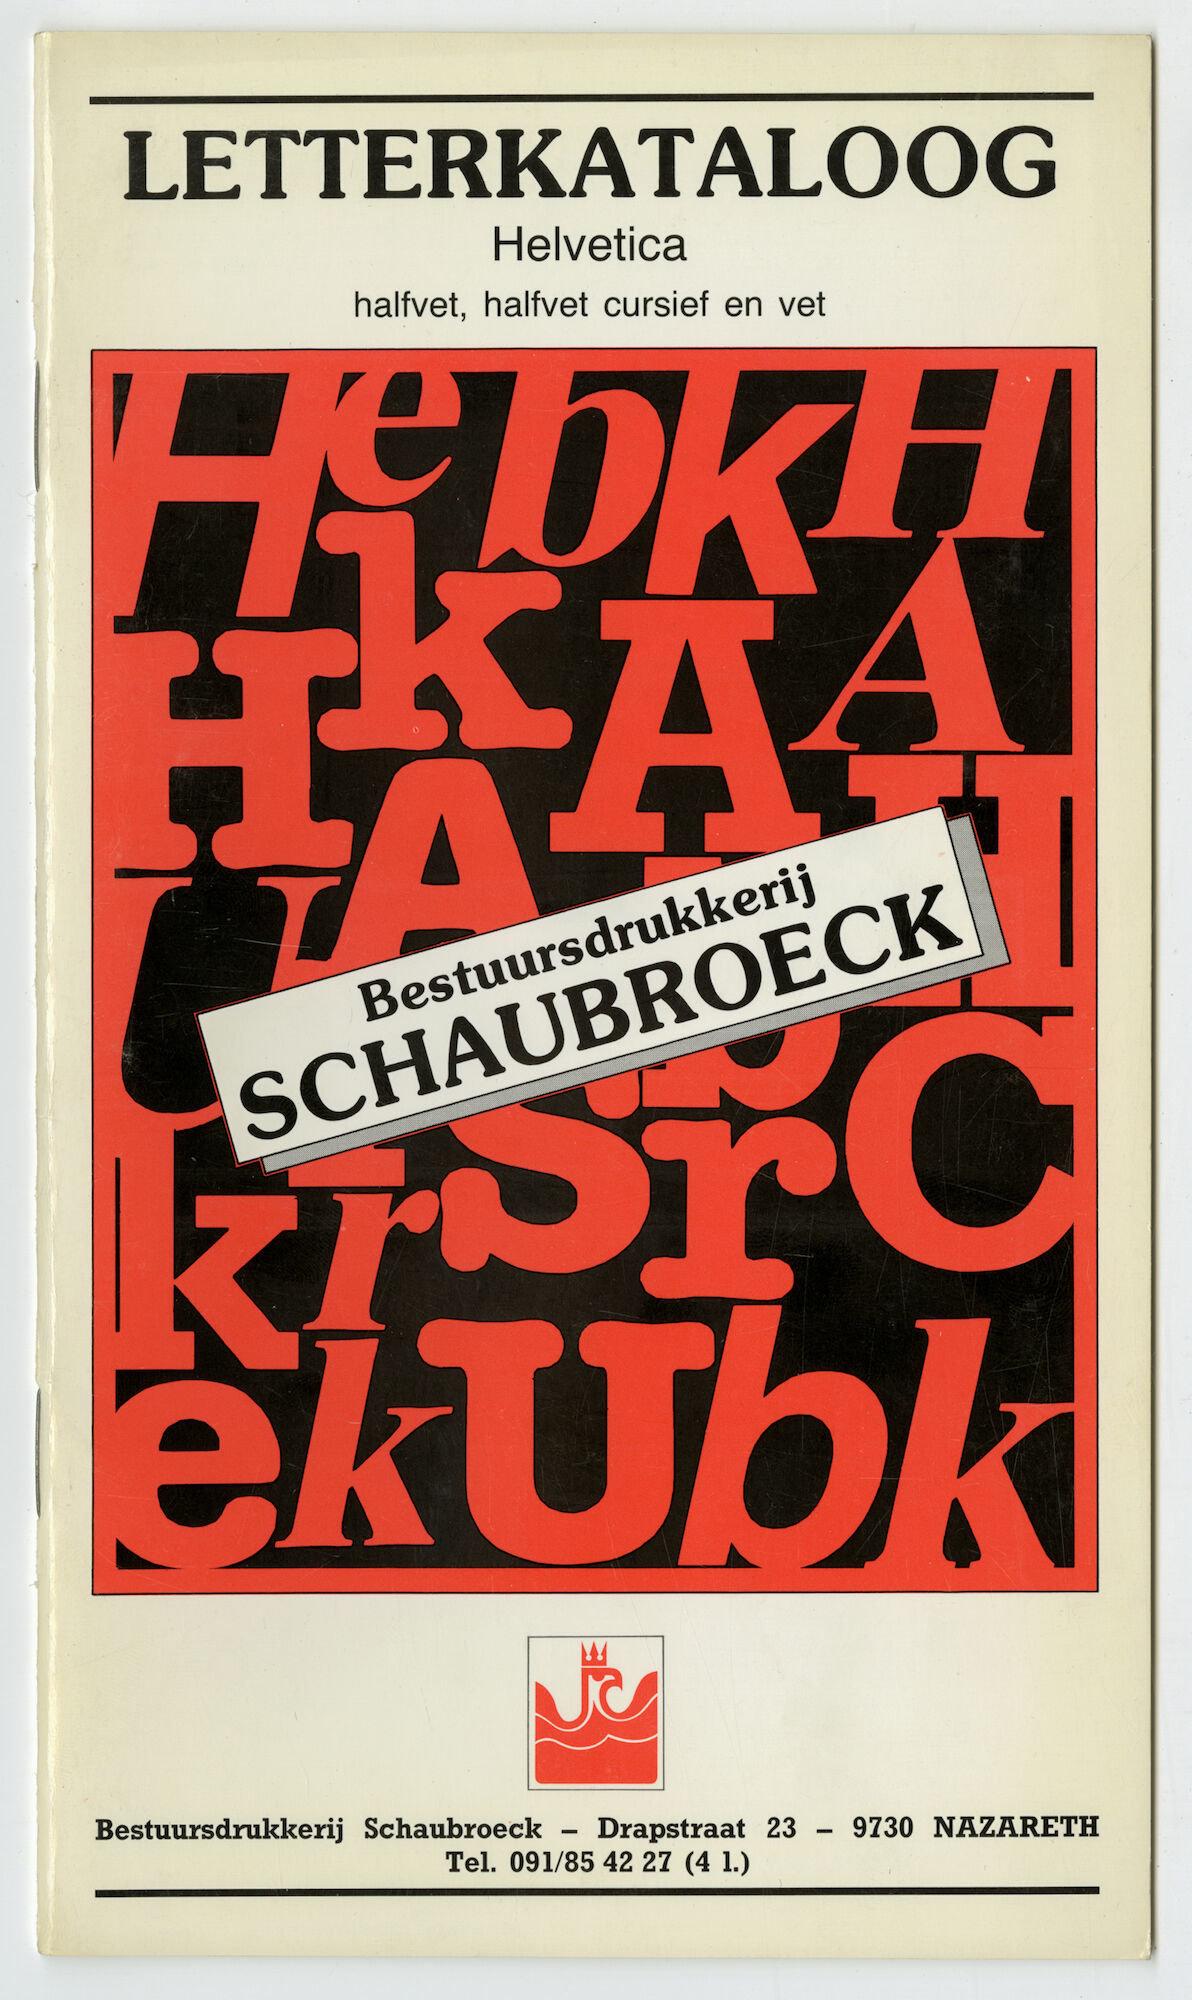 Letterproef met het lettertype Helvetica